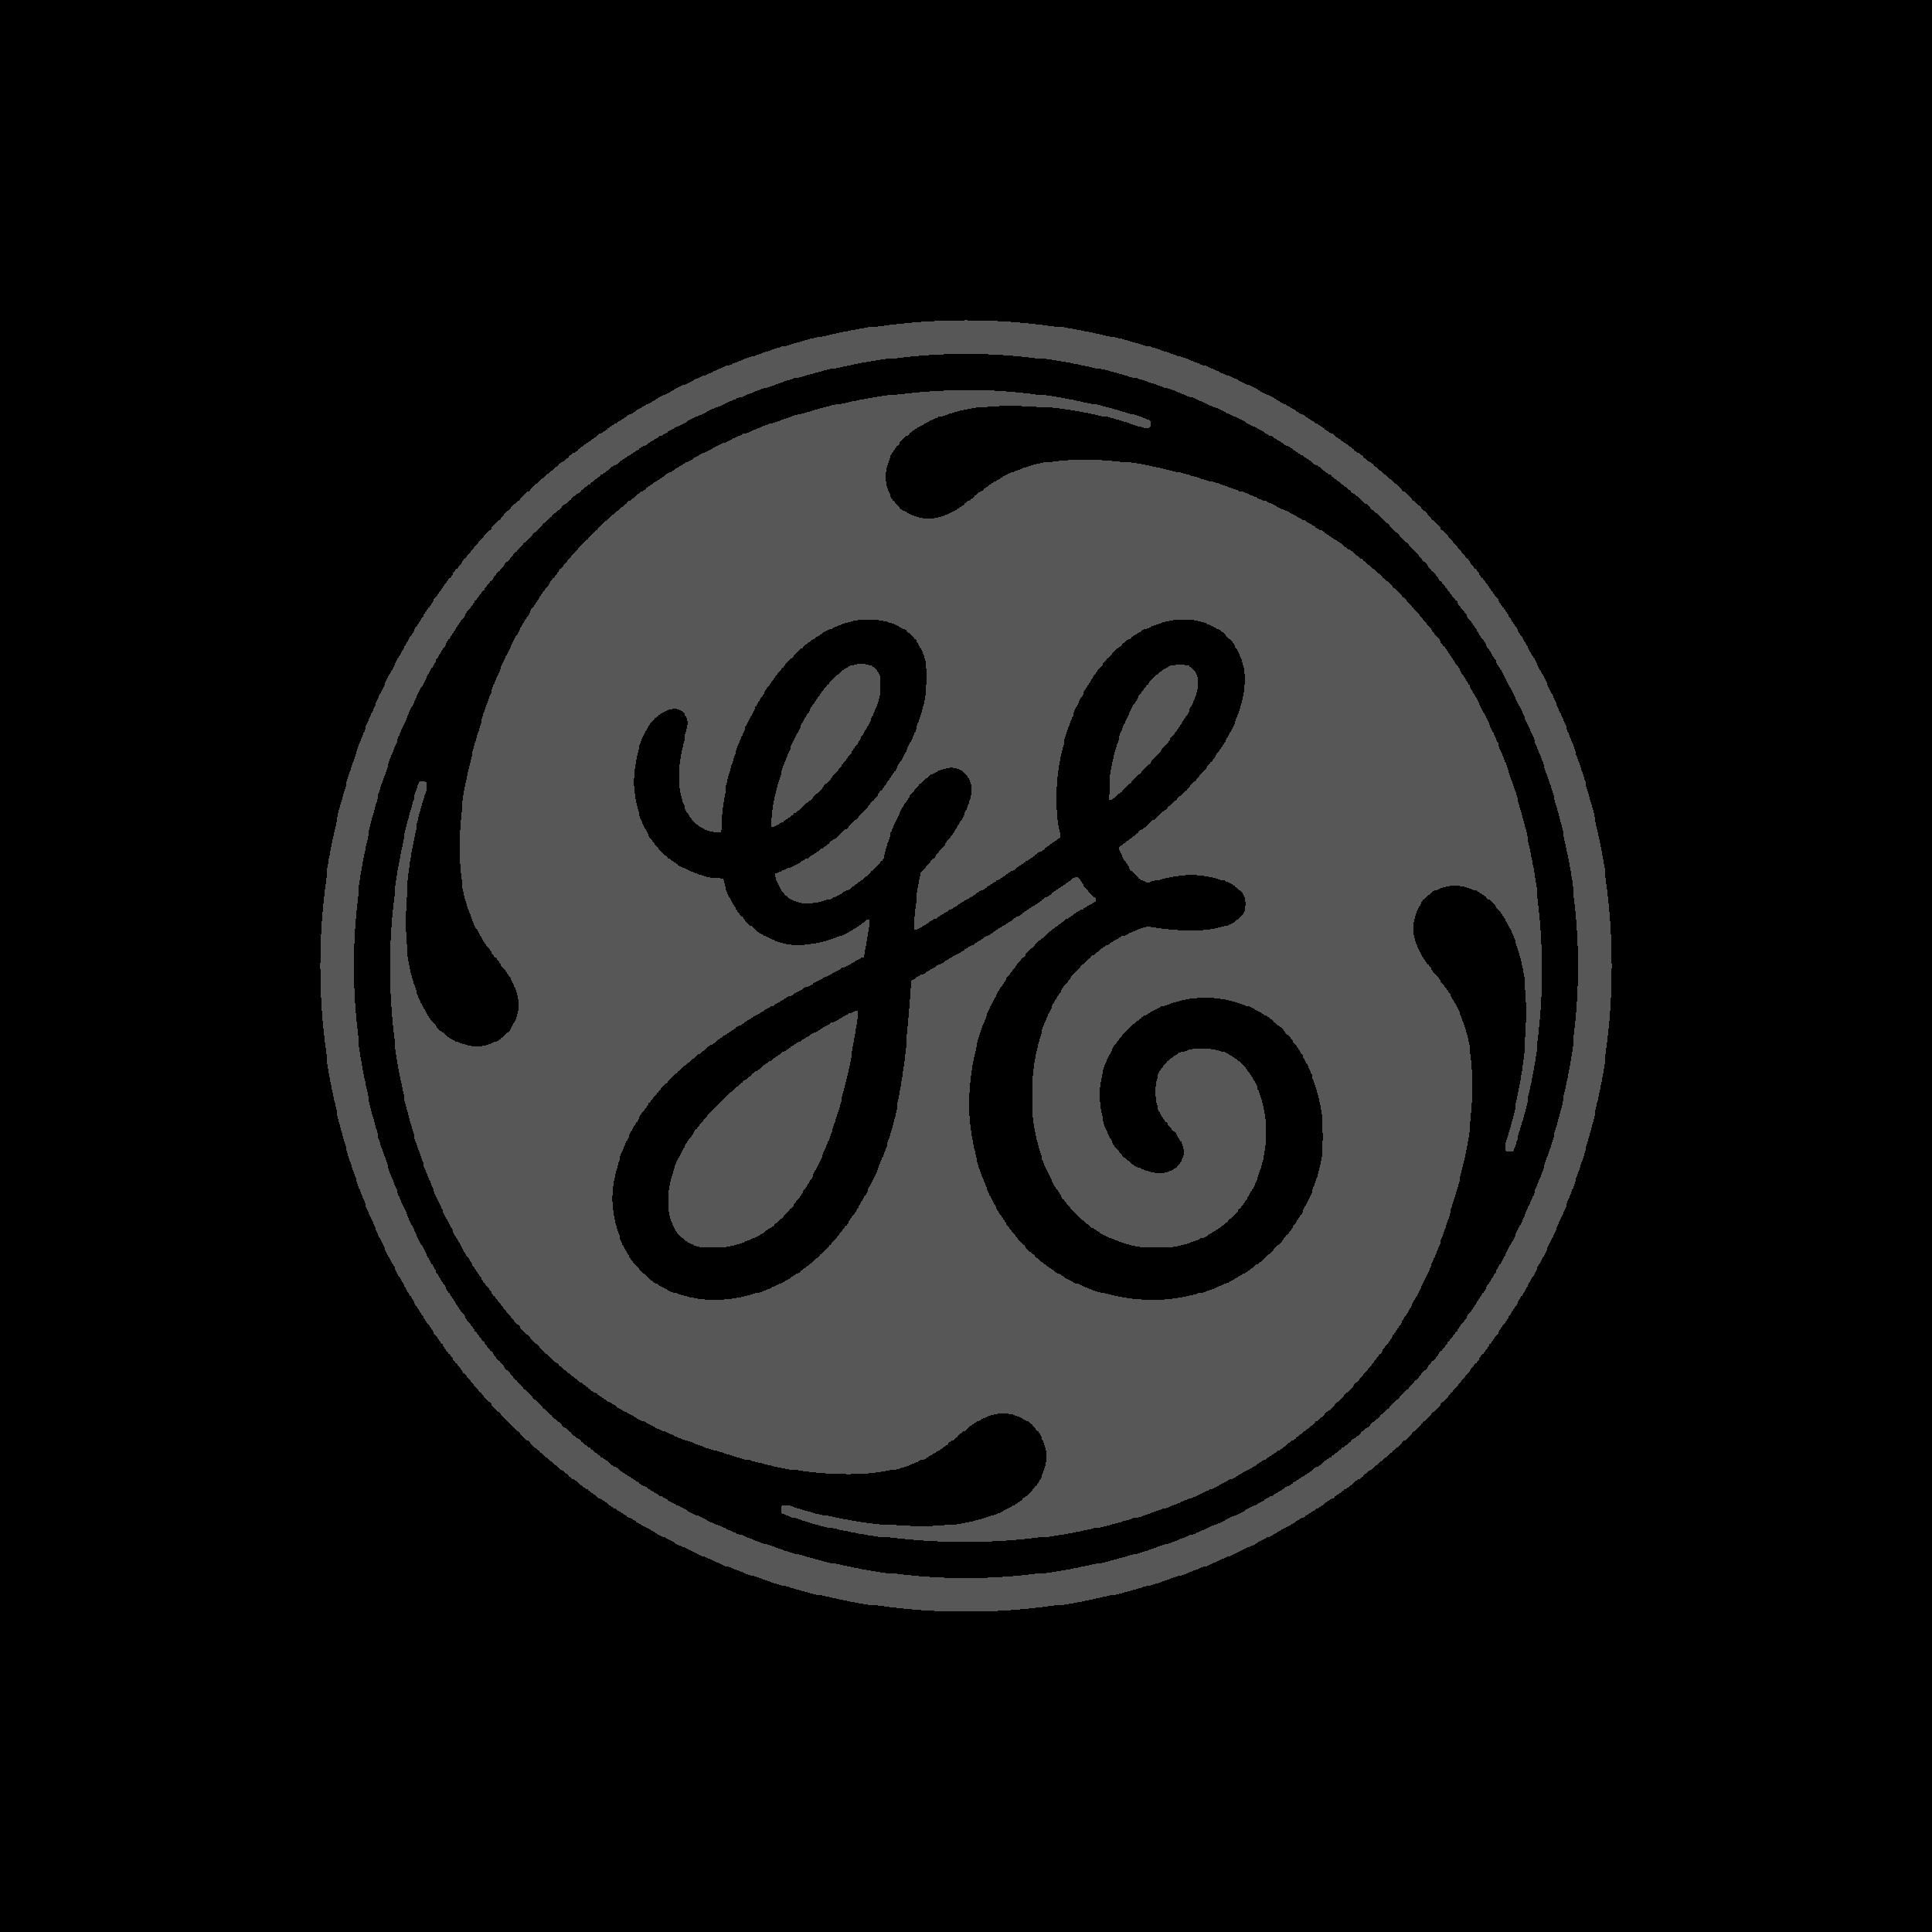 ge_monogram_primary_gray_RGB.png